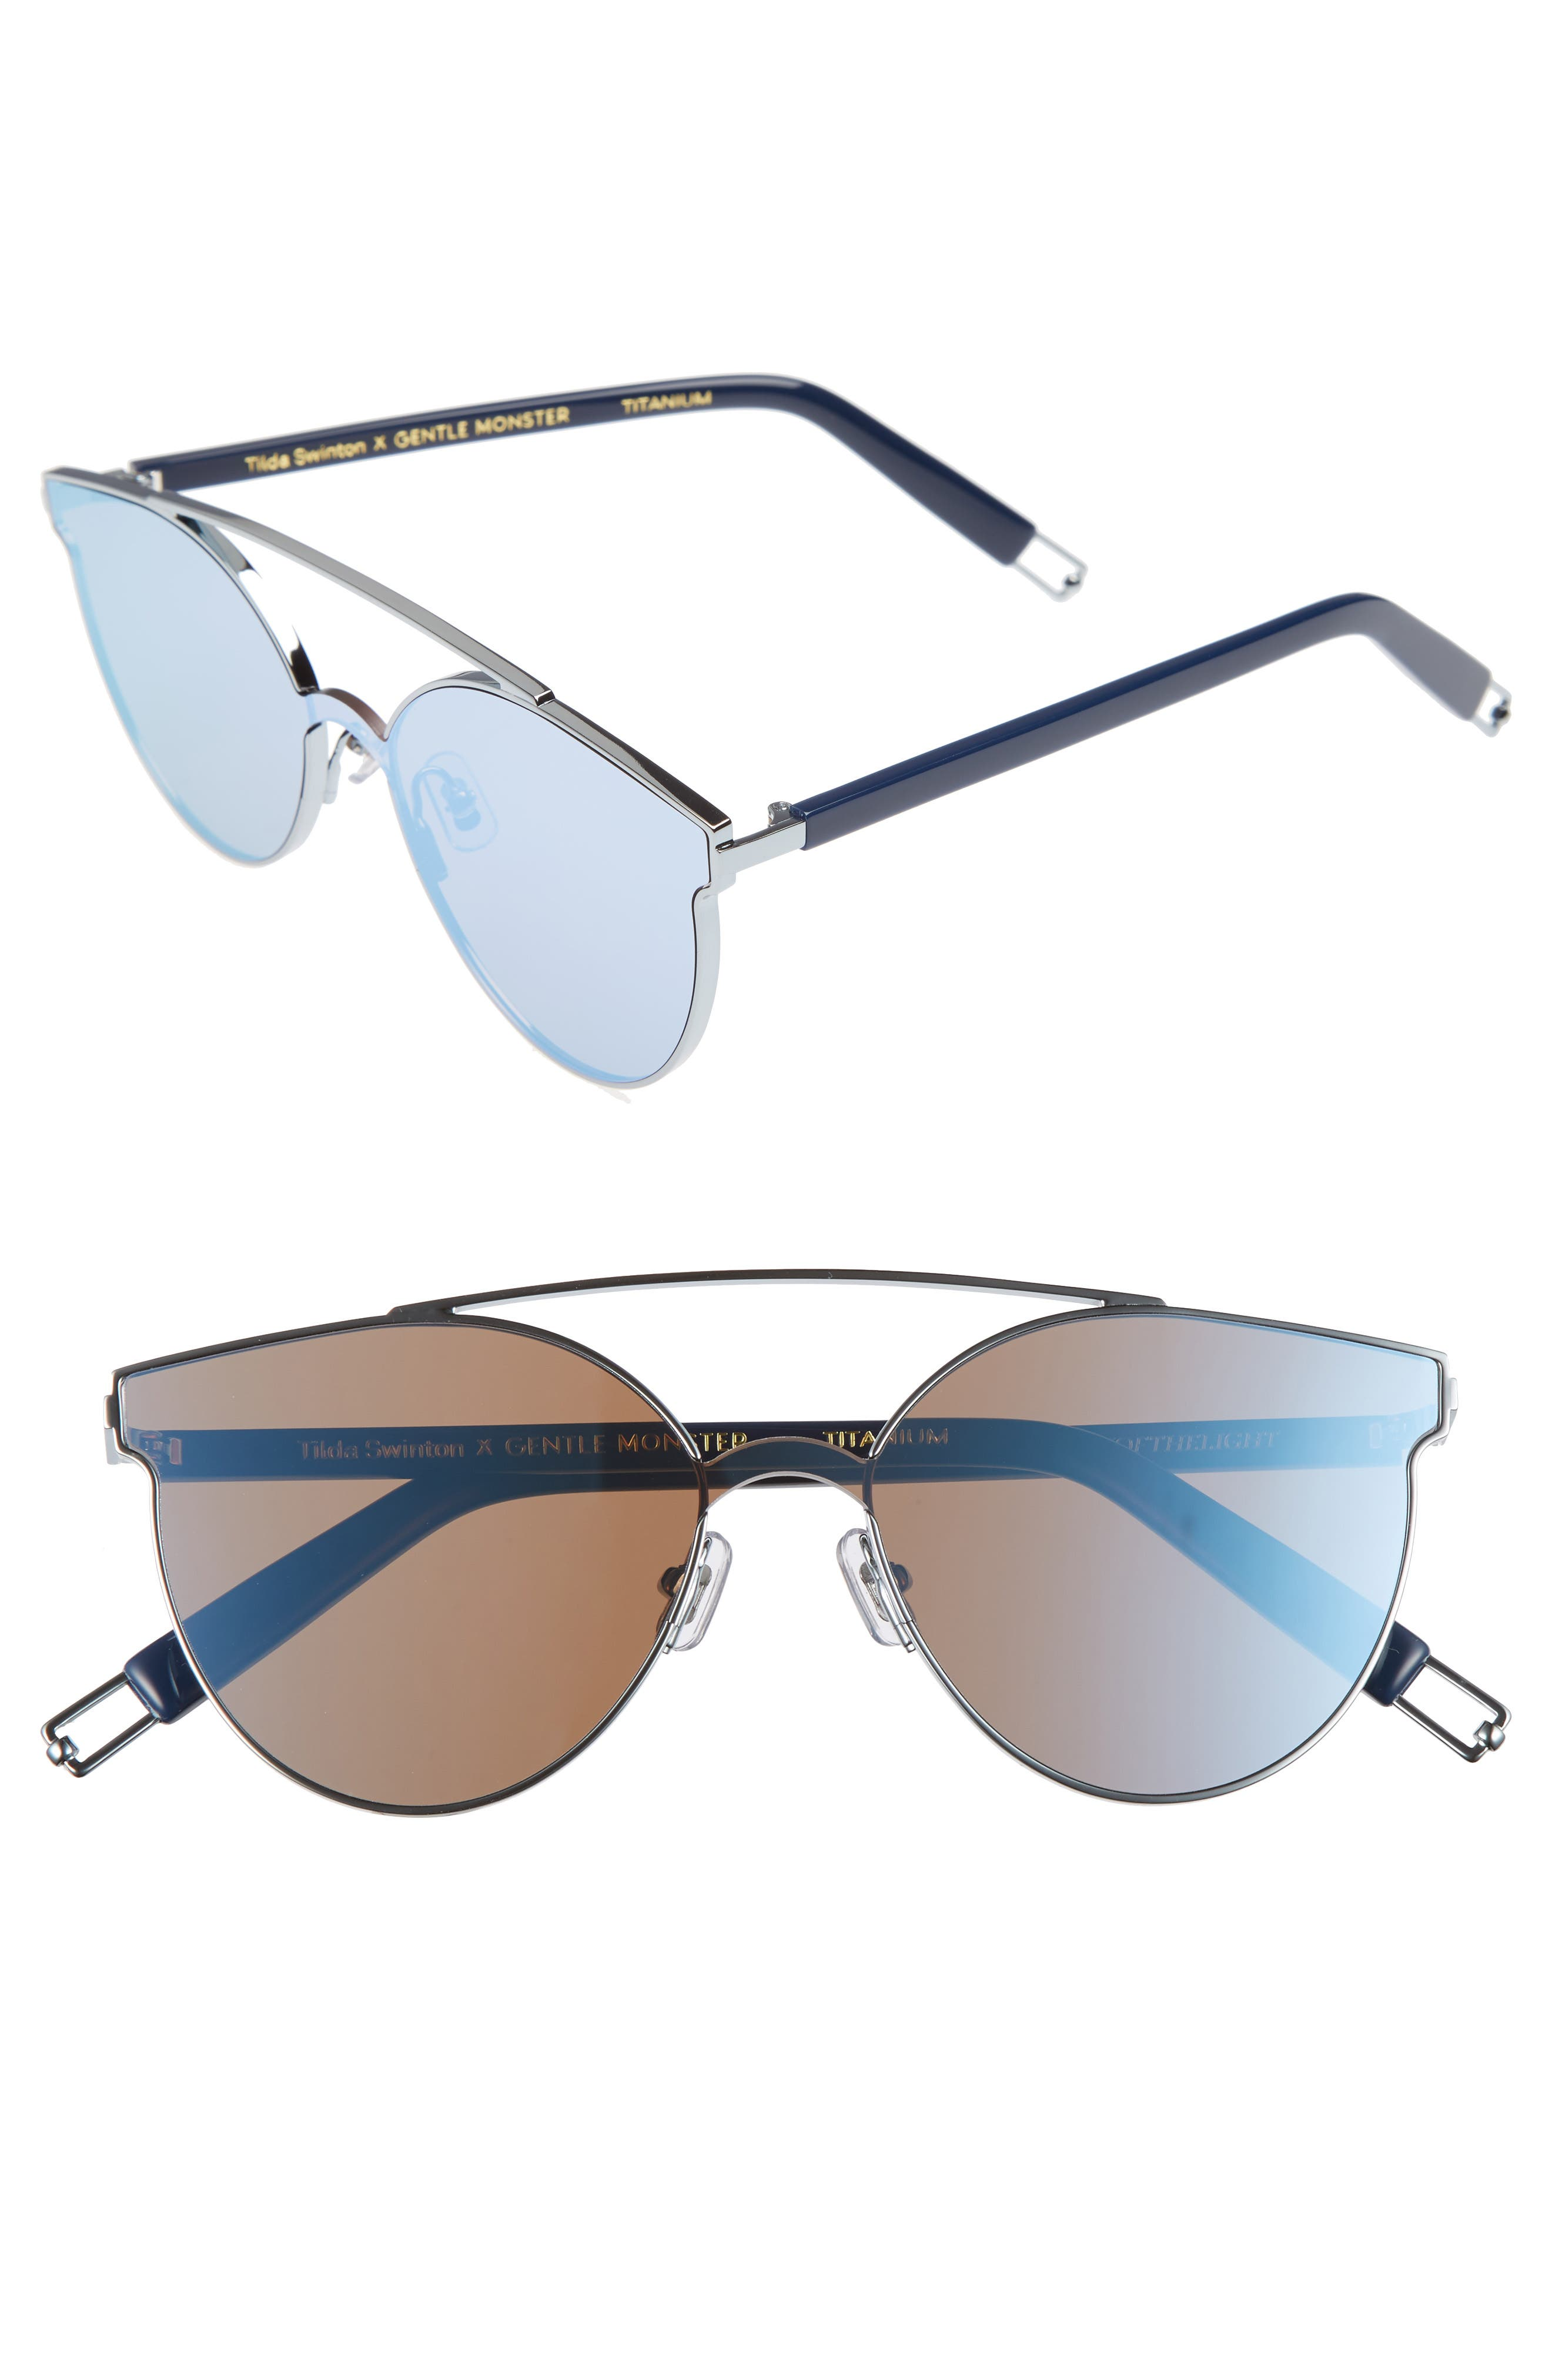 Alternate Image 1 Selected - Tilda Swinton x Gentle Monster Trick of the Light 60mm Shield Sunglasses